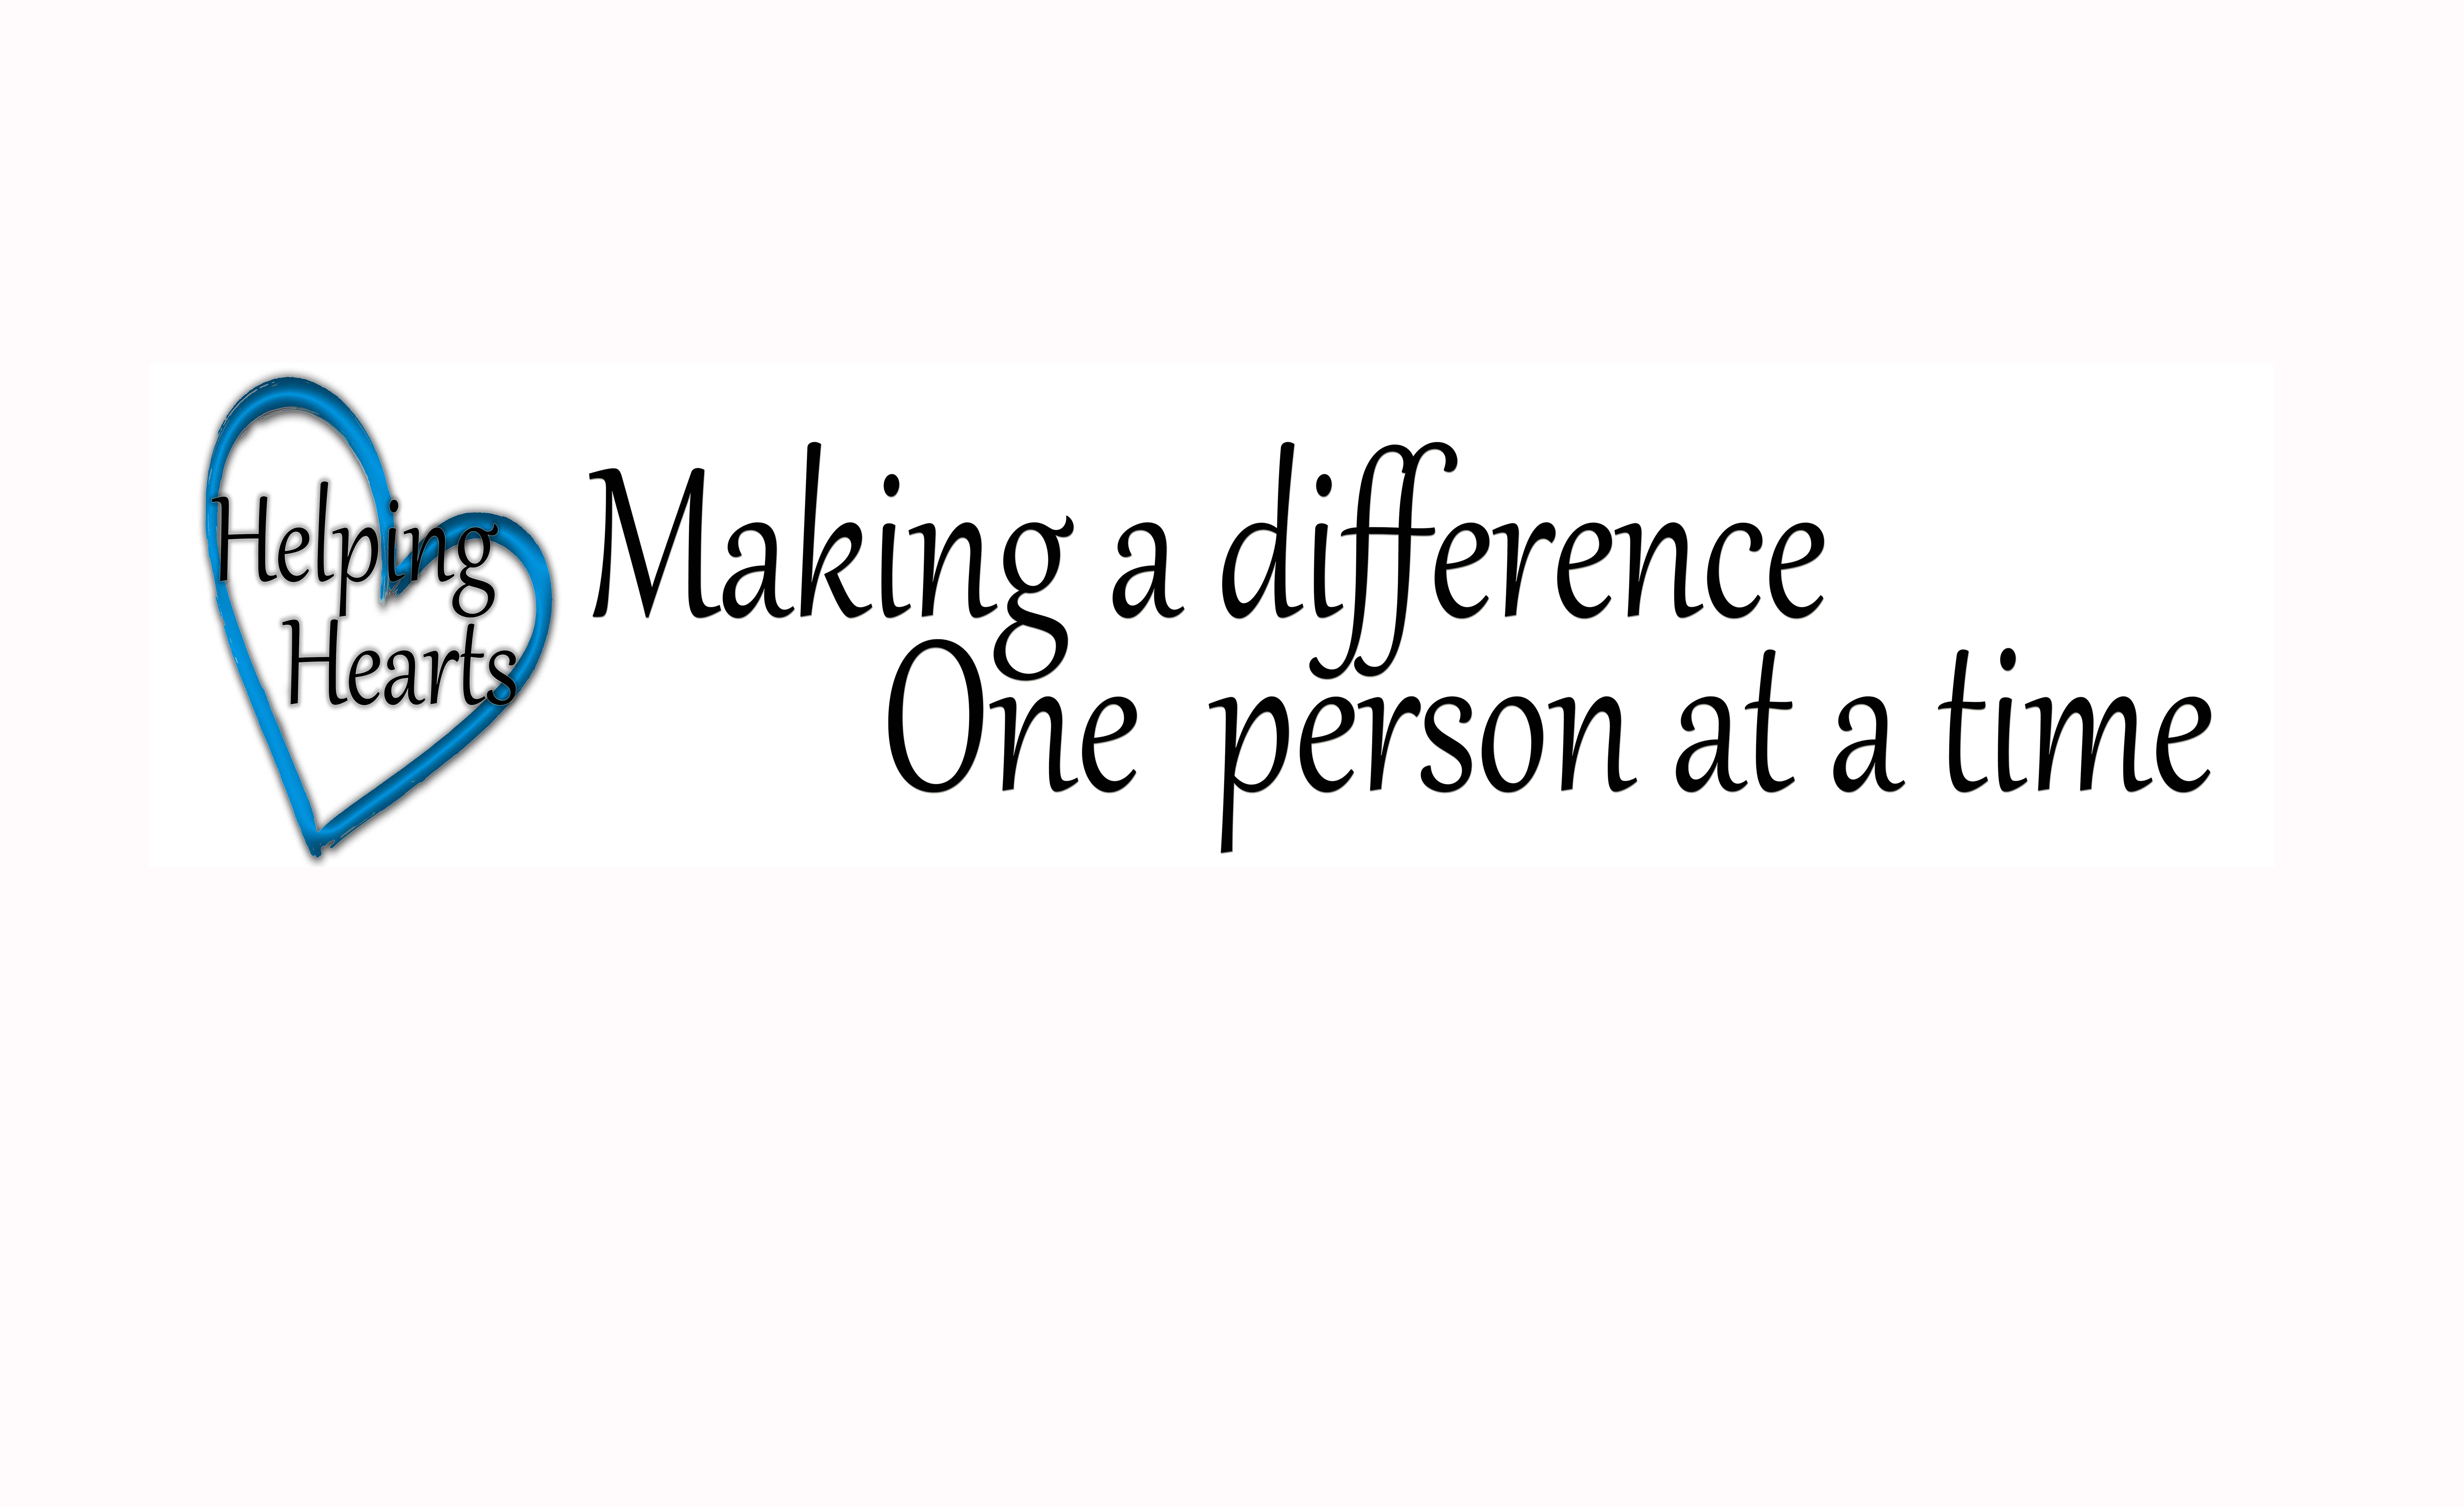 Helping Hearts Foundation - Sacramento, CA